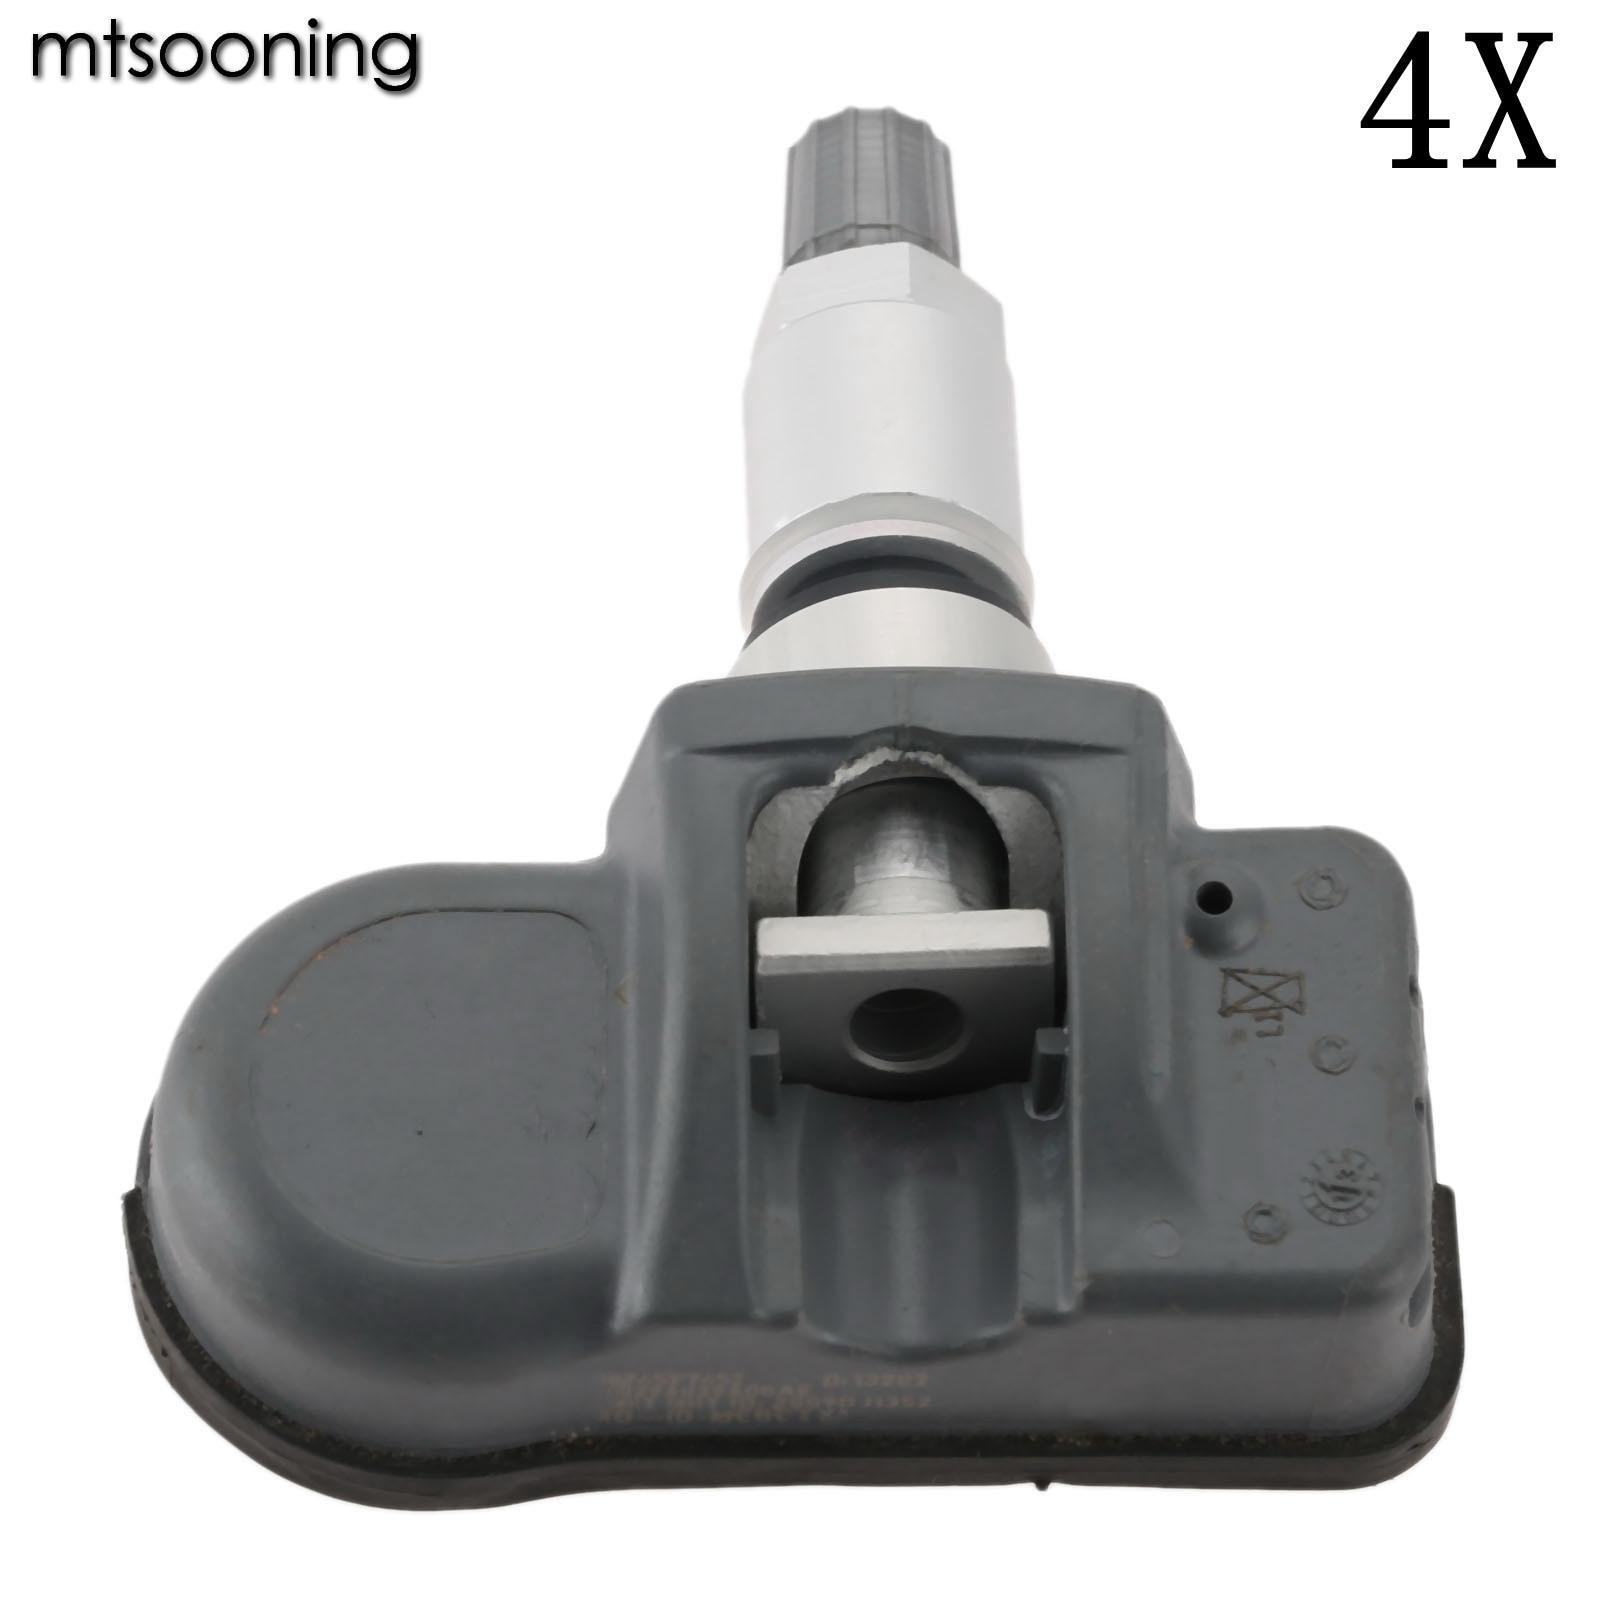 mtsooning 4Pcs TPMS Tire Pressure Sensor 56029400AE 433.92 MHz New For Mercedes Benz Chrysler Dodge Fiat Jeep 2007 2013